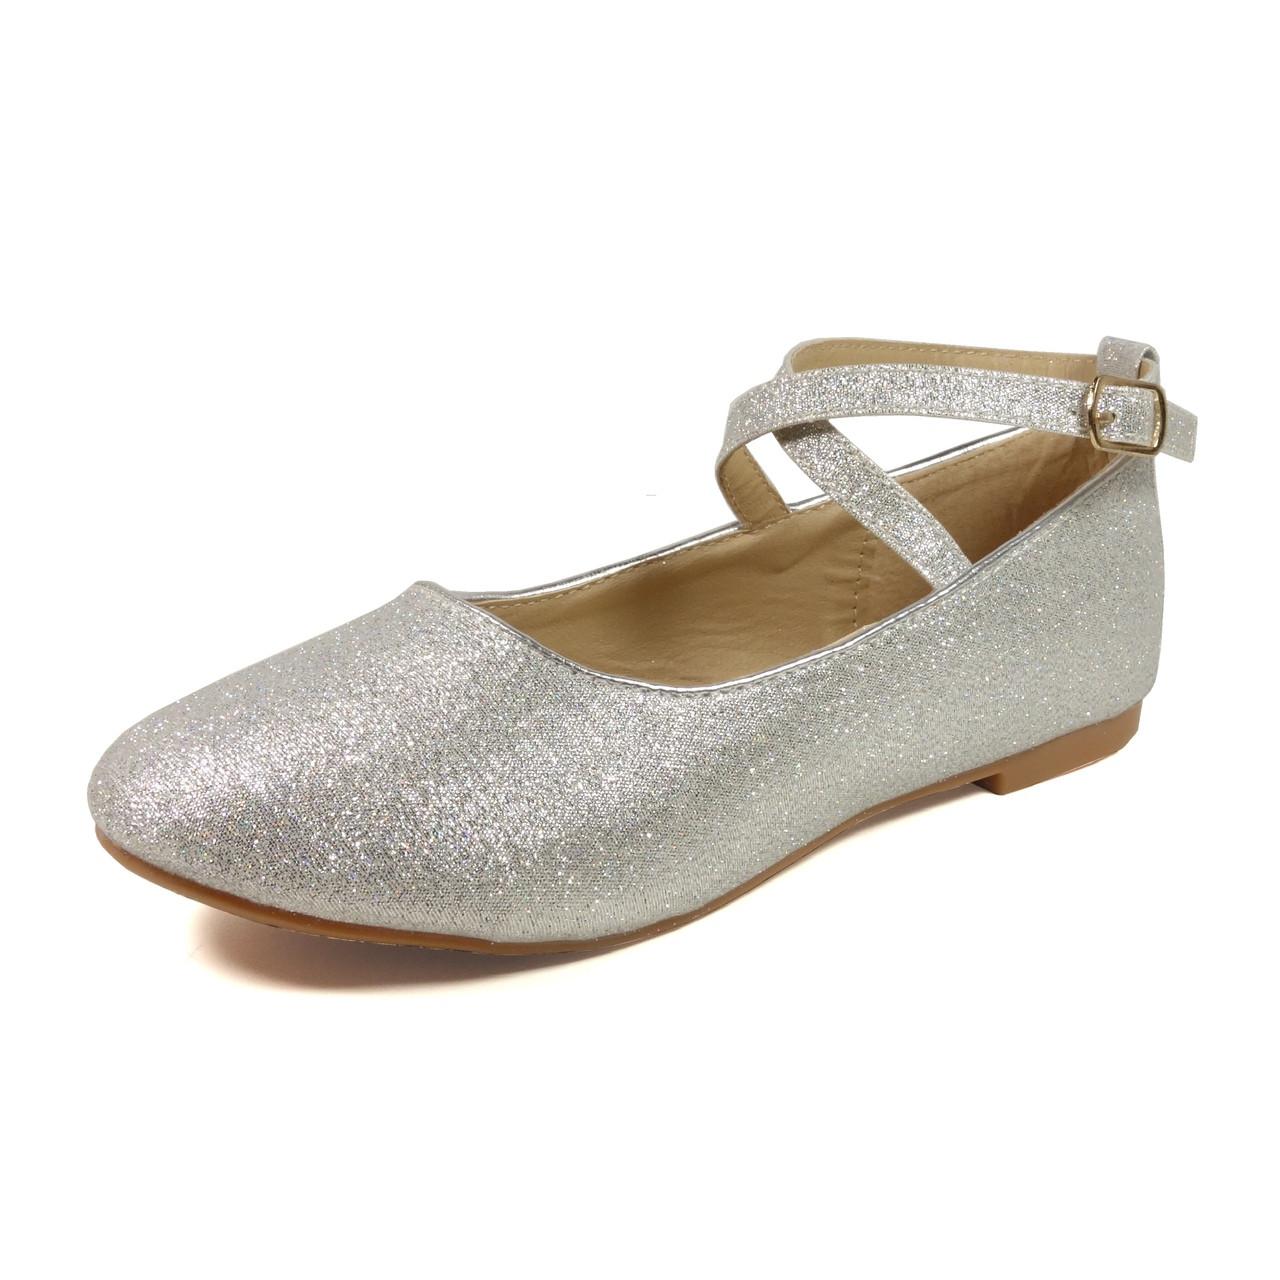 8f1f61bfdf17 Nova Utopia Toddler Little Girls Flat Shoes - NFGF041 Silver Glitter ...